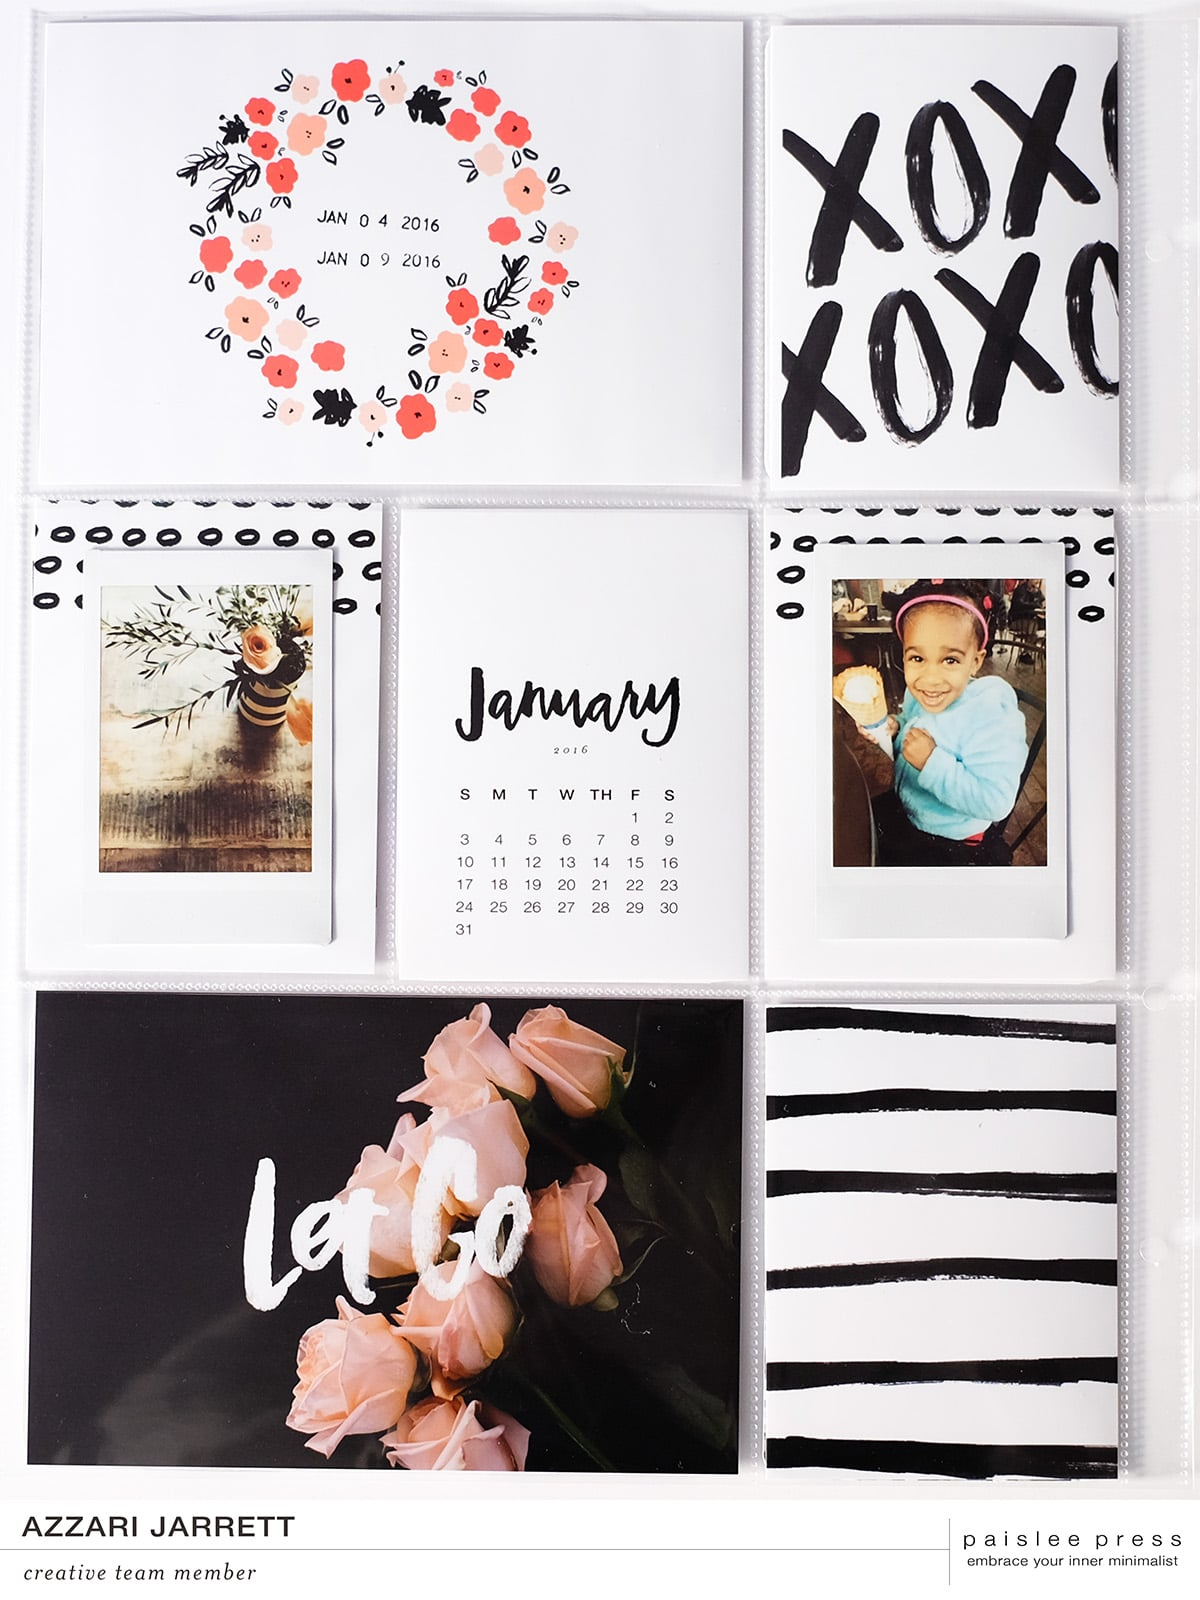 January Project Life Layout | Azzari Jarrett